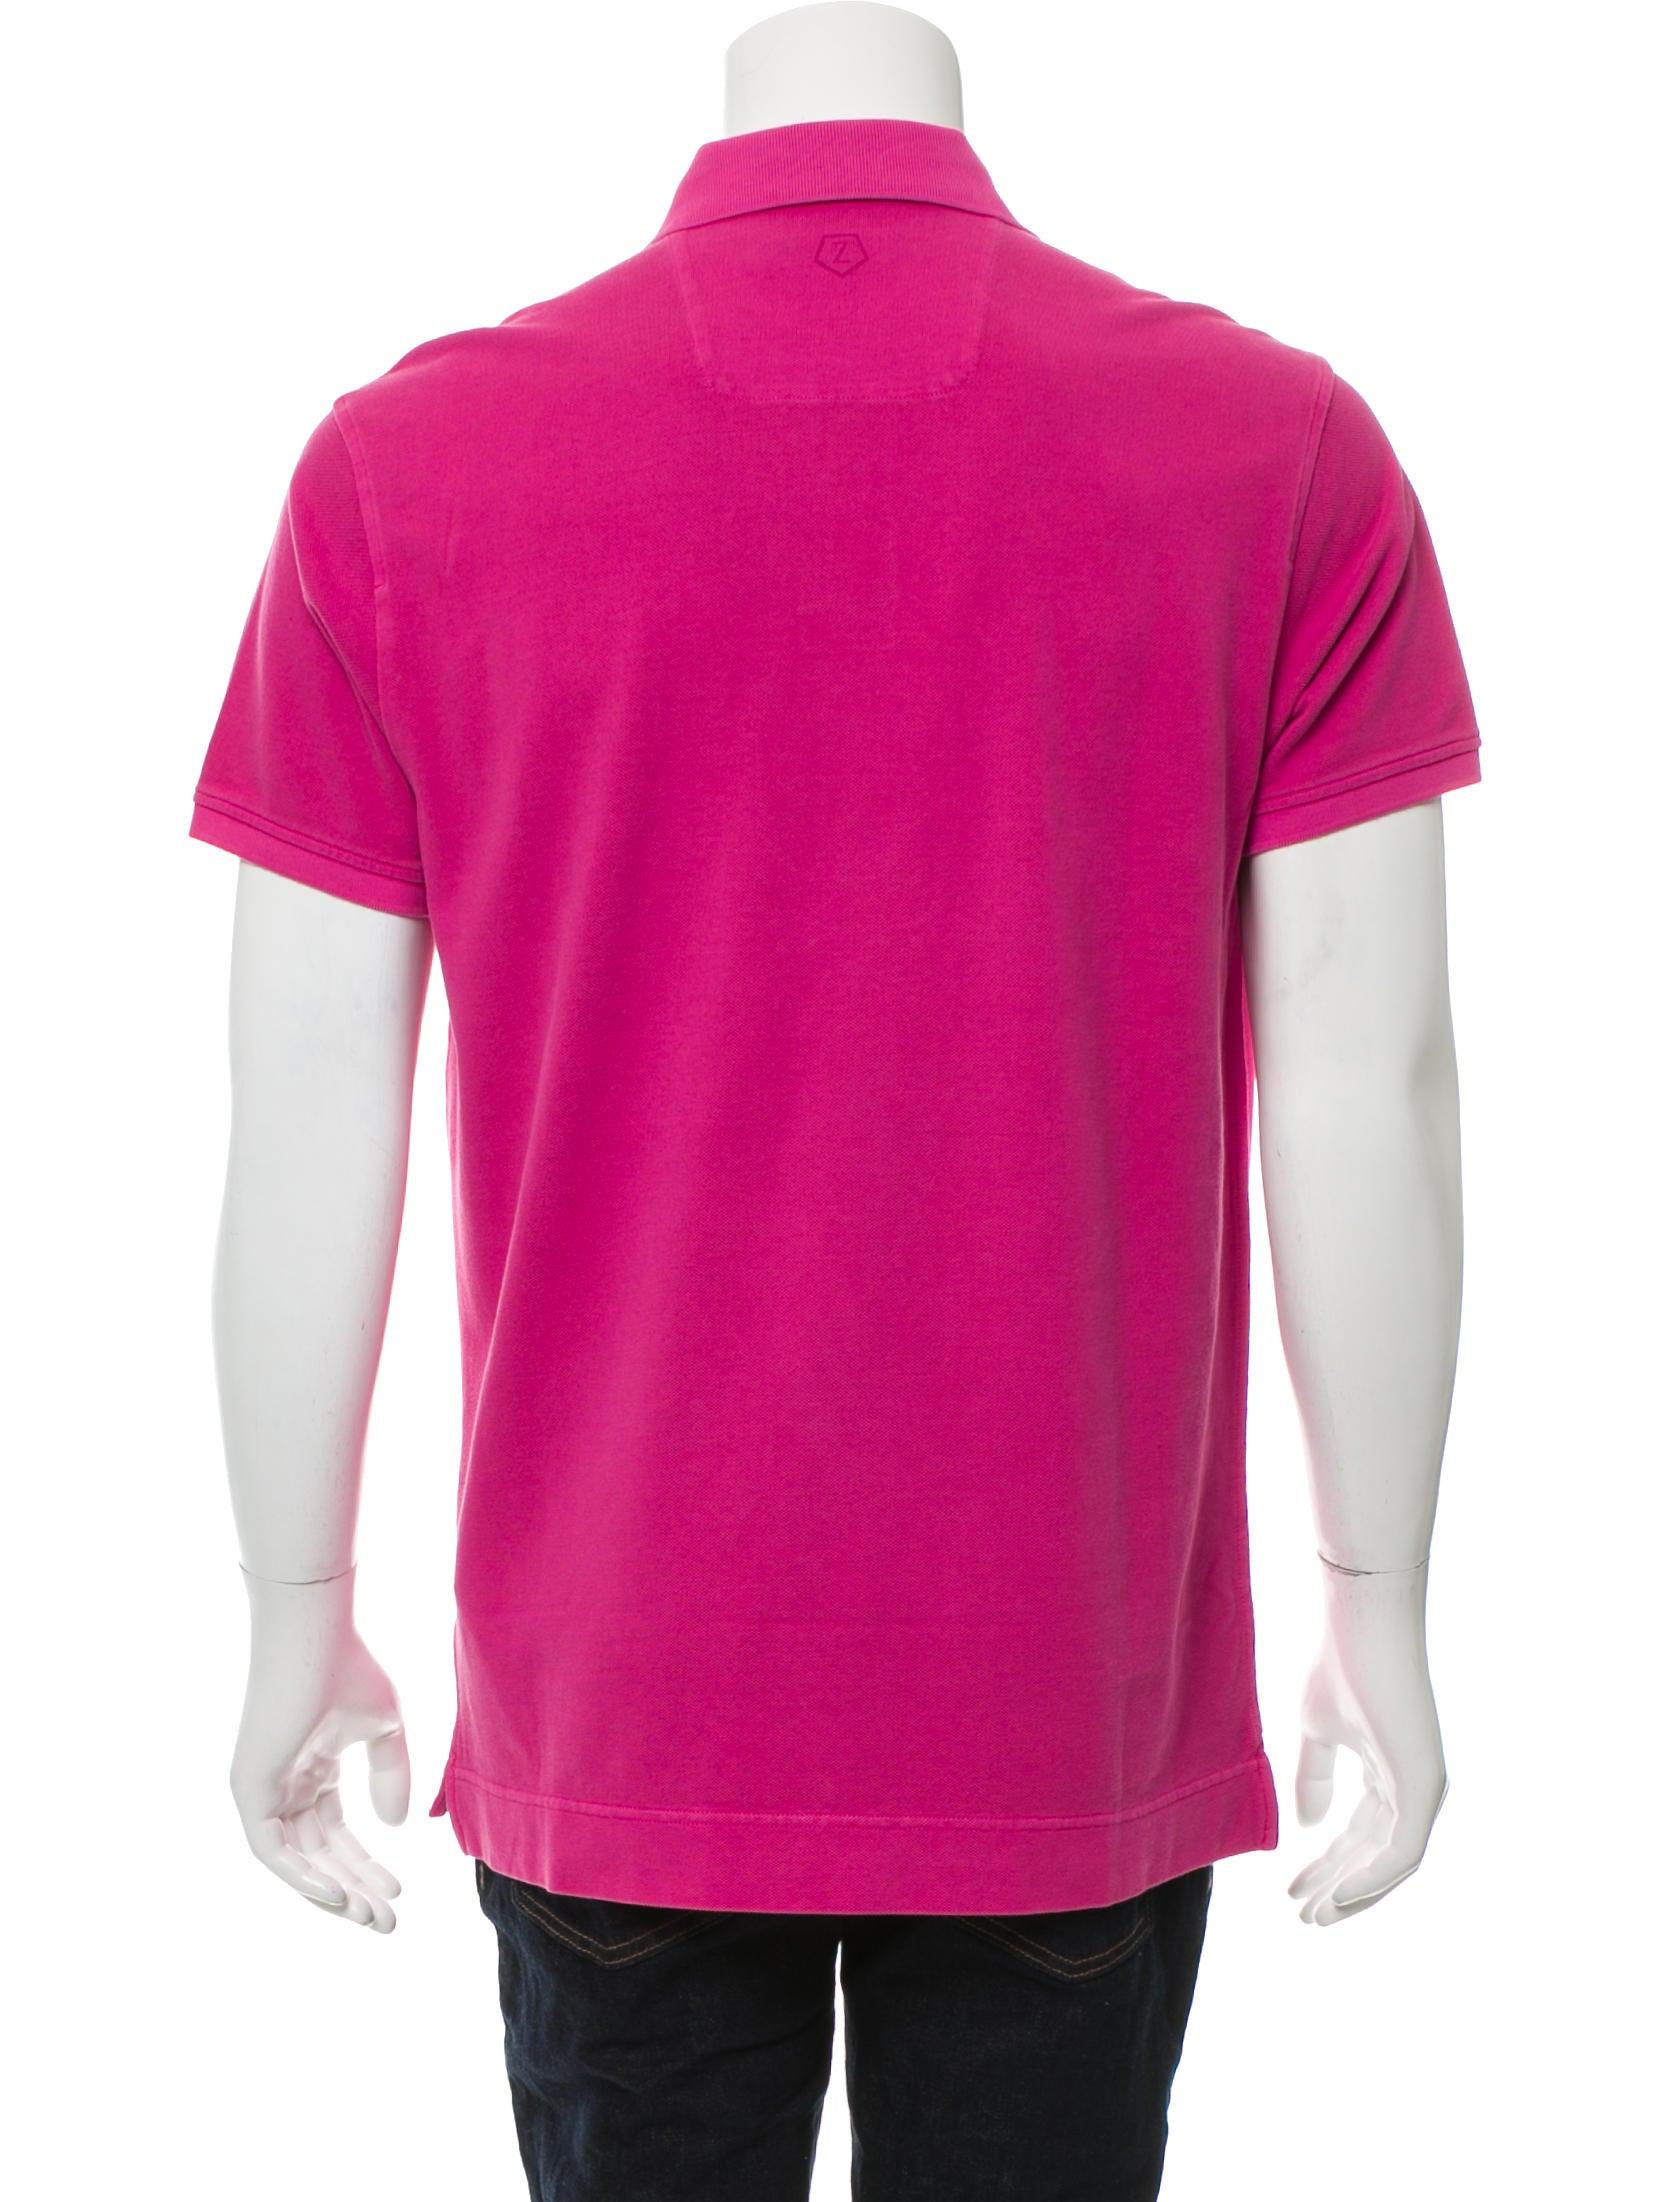 Z zegna knit polo shirt w tags clothing zzg20217 for Zegna polo shirts sale